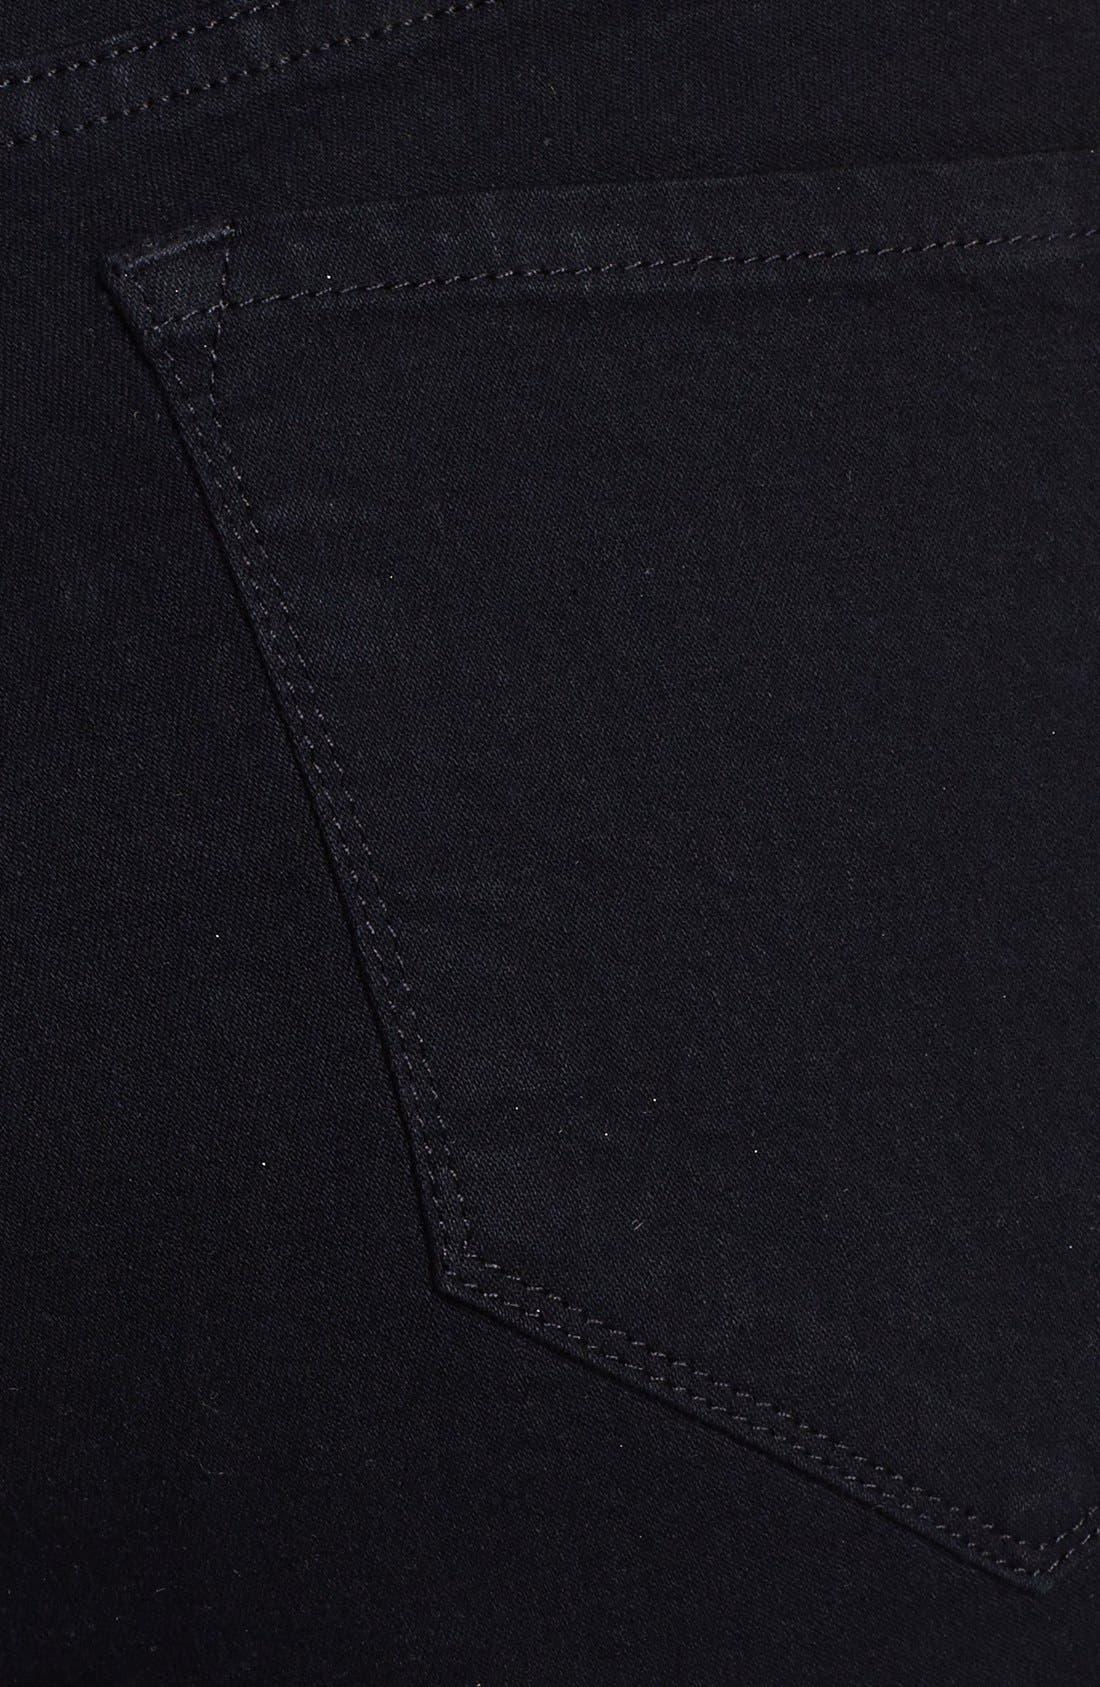 Alternate Image 3  - NYDJ 'Sheri' Embellished Trim Stretch Skinny Jeans (Plus Size)